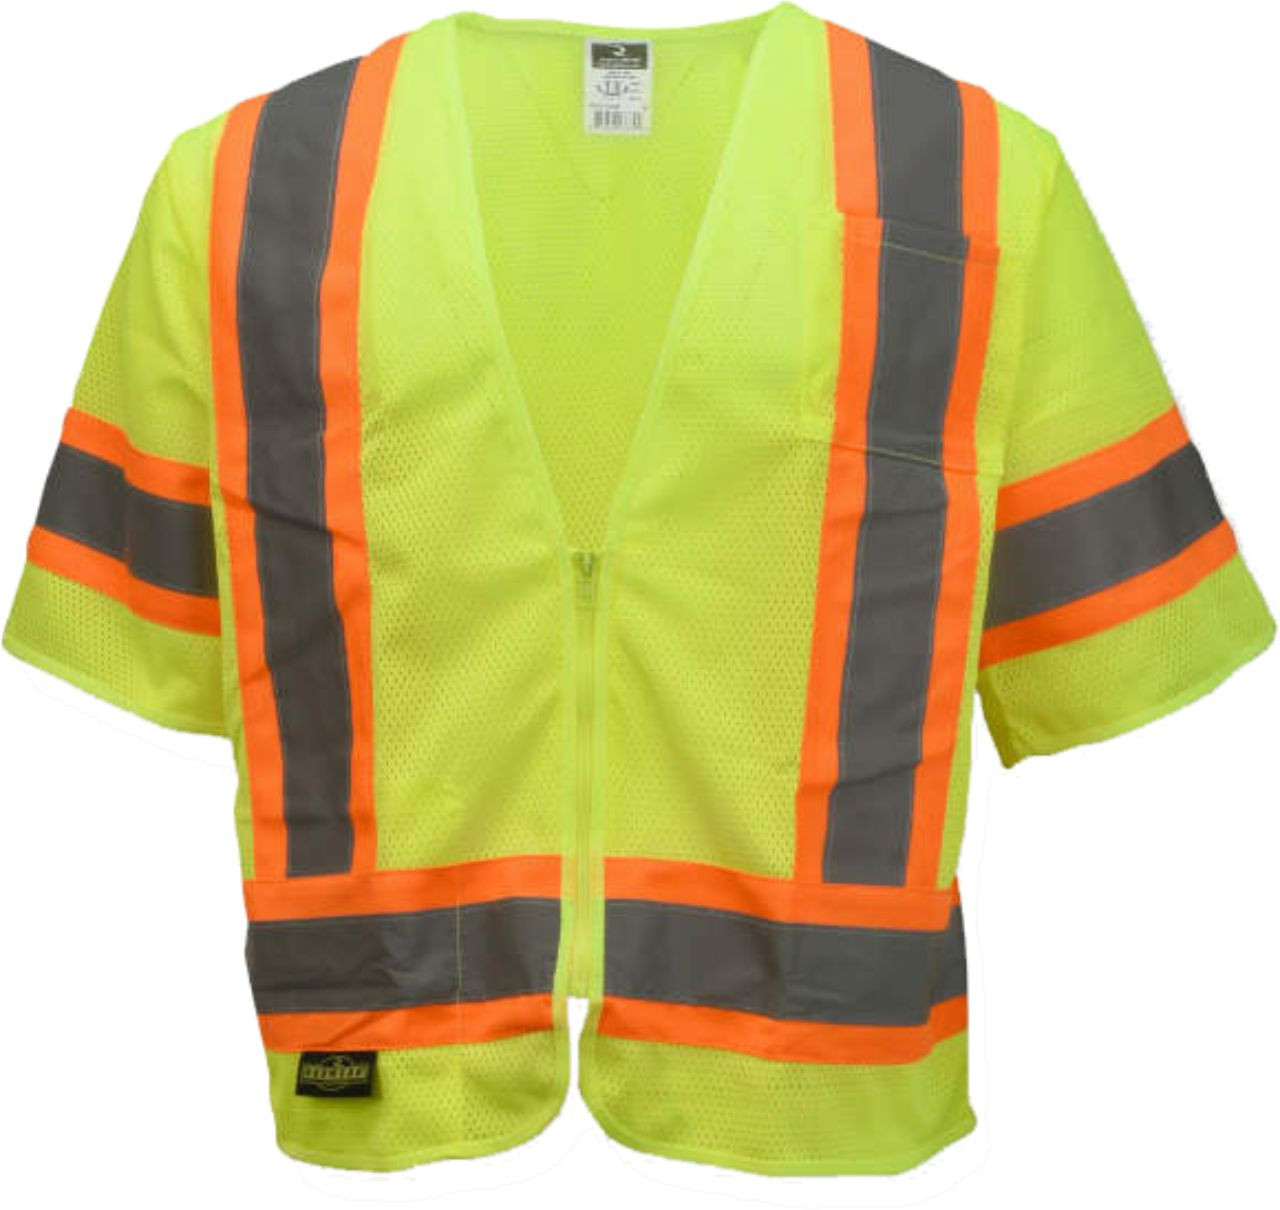 Safety Green 3 Tone Class 2 Safety Vest